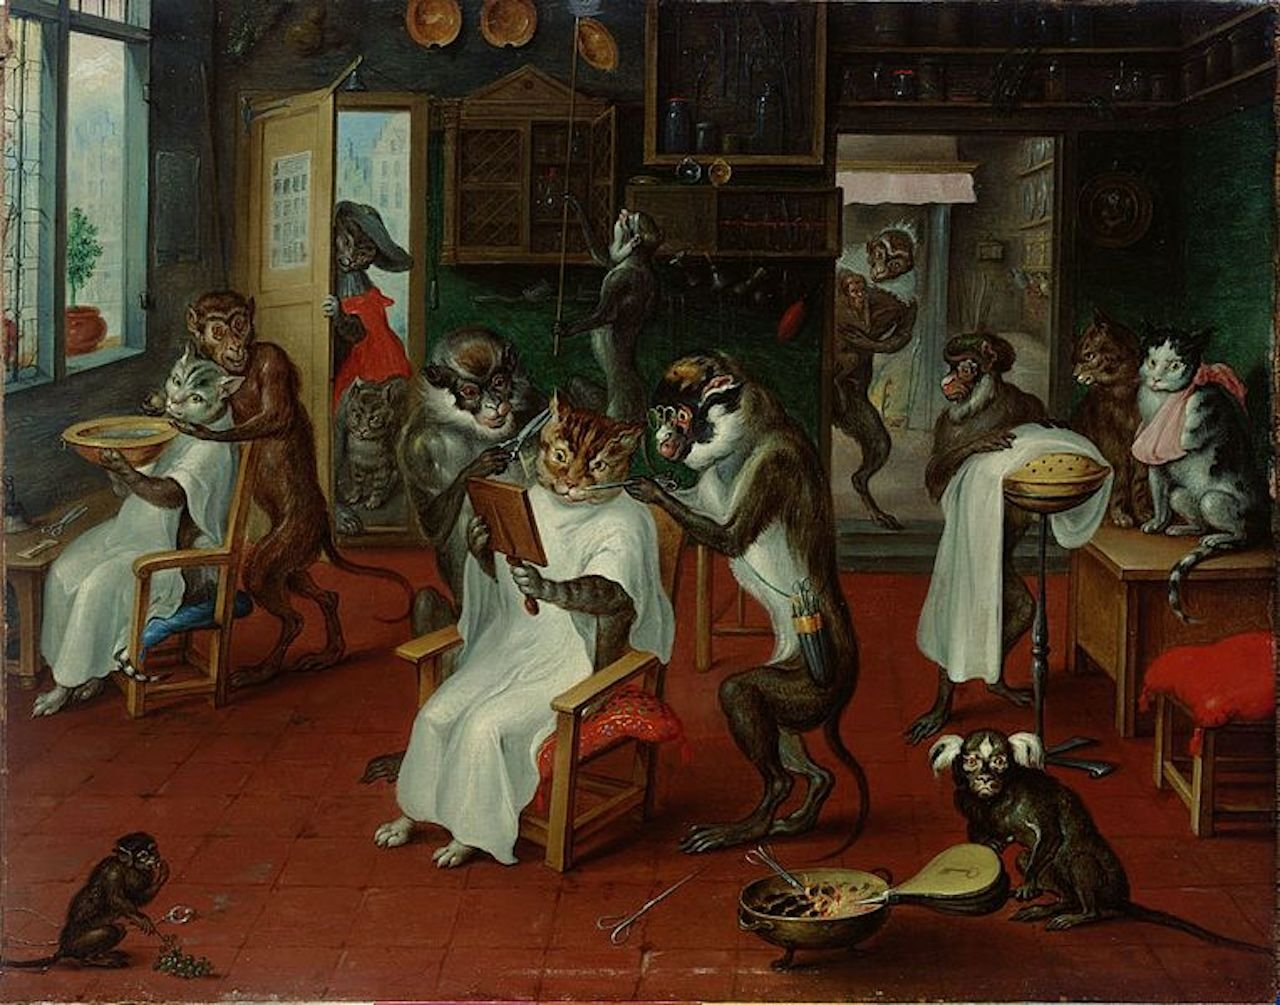 abraham_teniers_-_barbershop_with_monkey